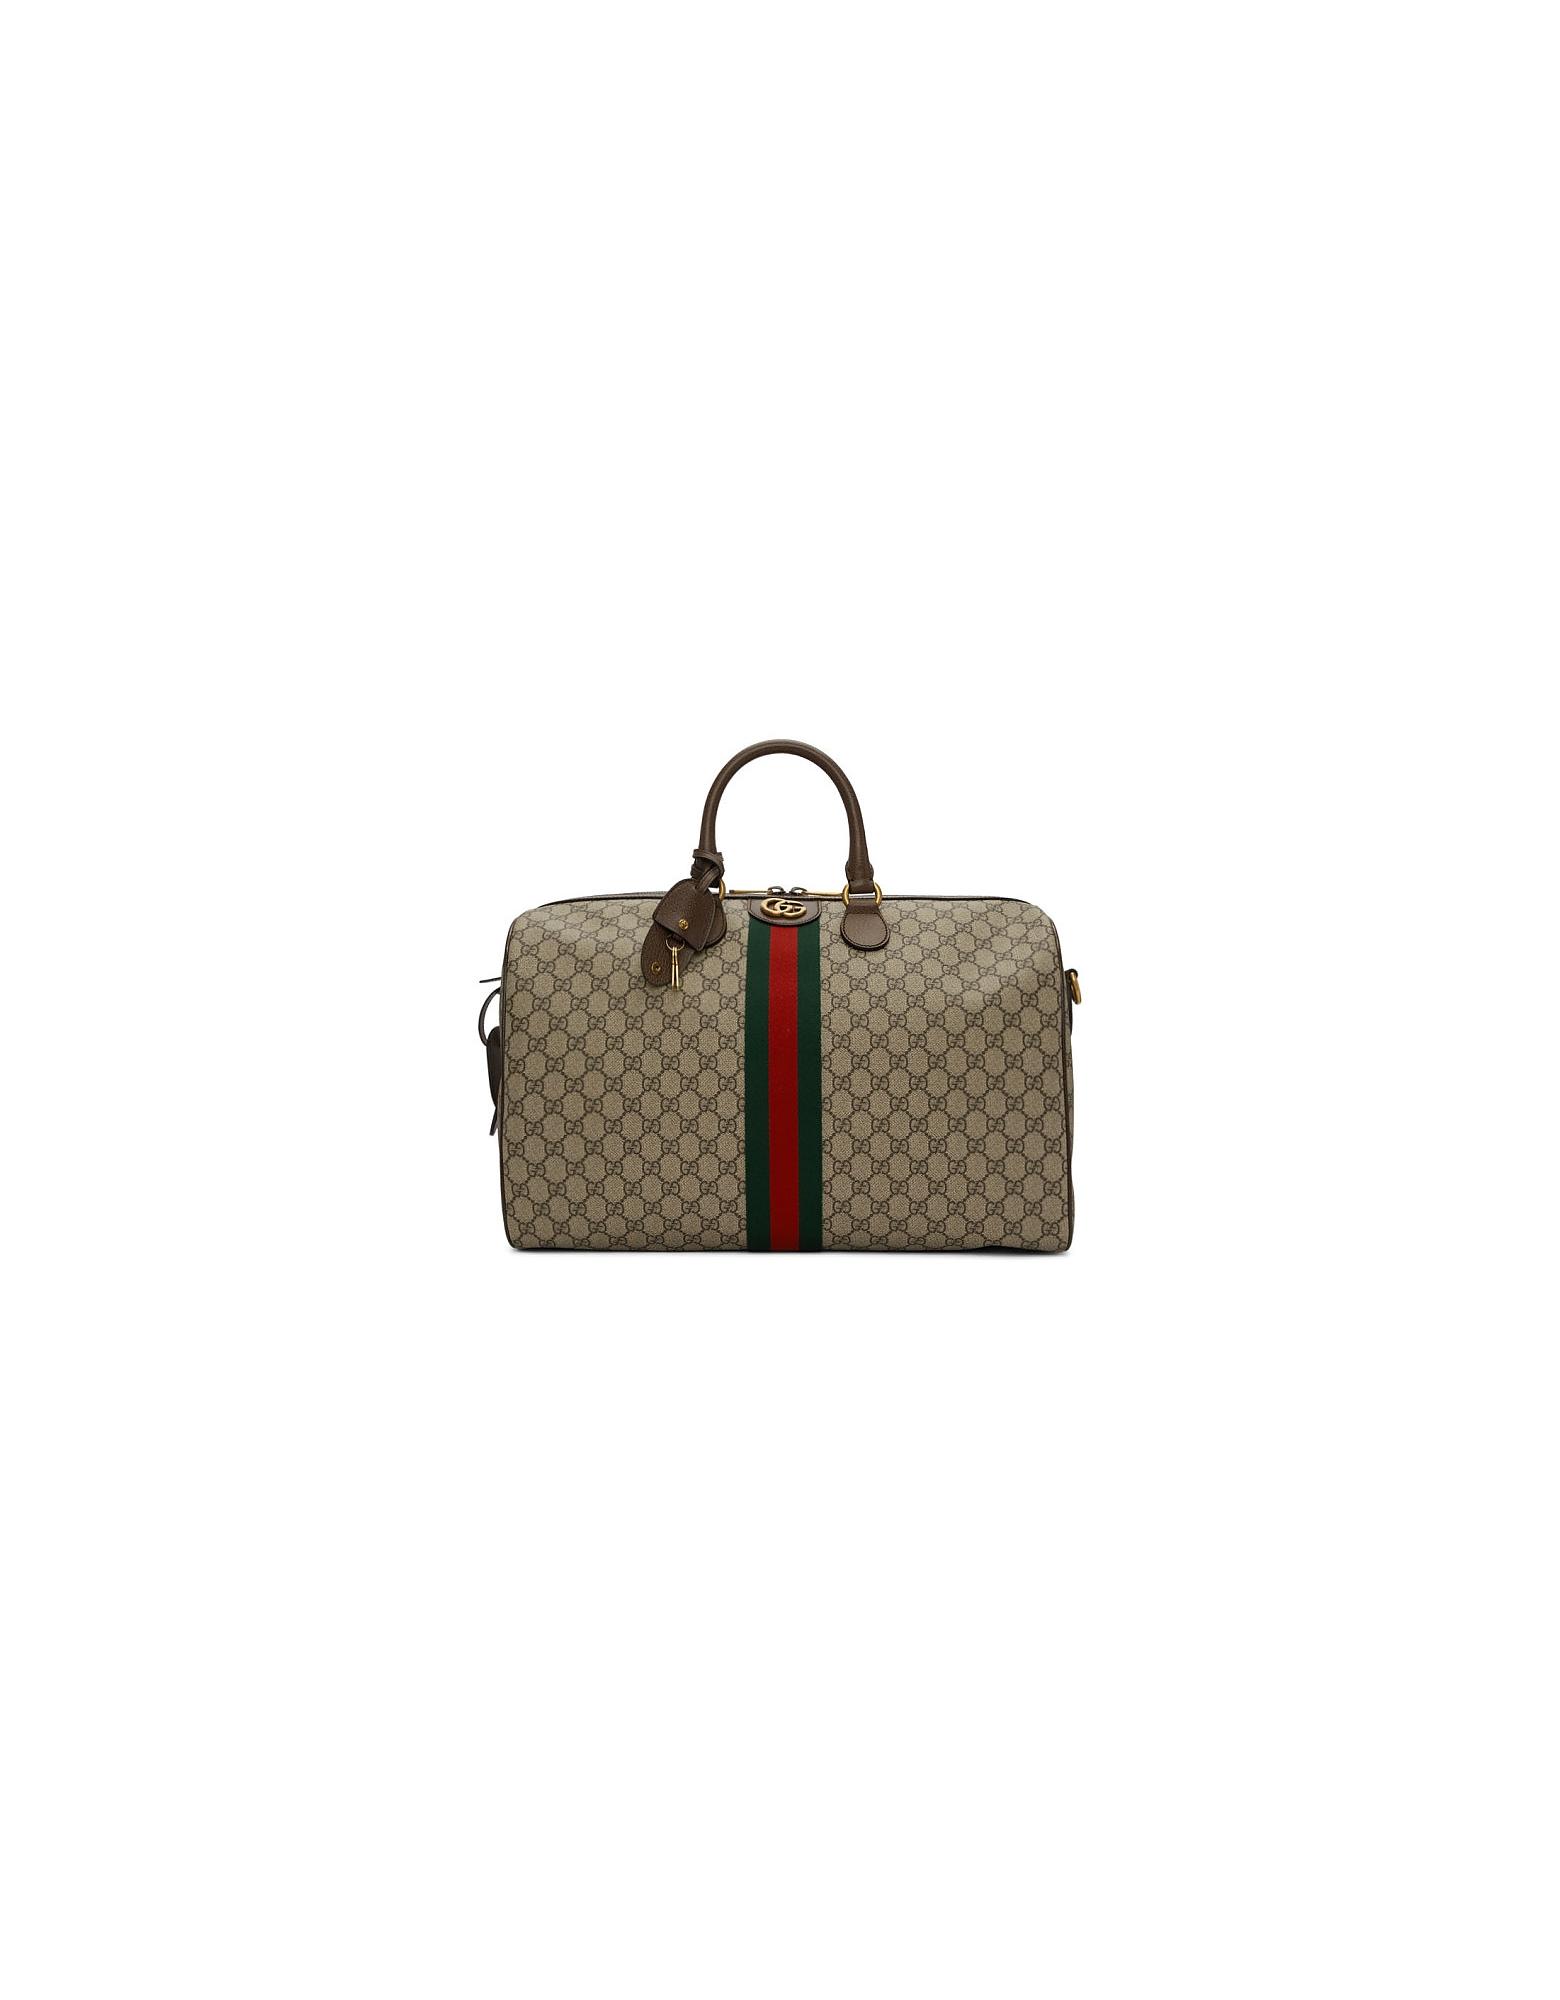 Gucci Designer Handbags, Beige GG Supreme Ophidia Duffle Bag